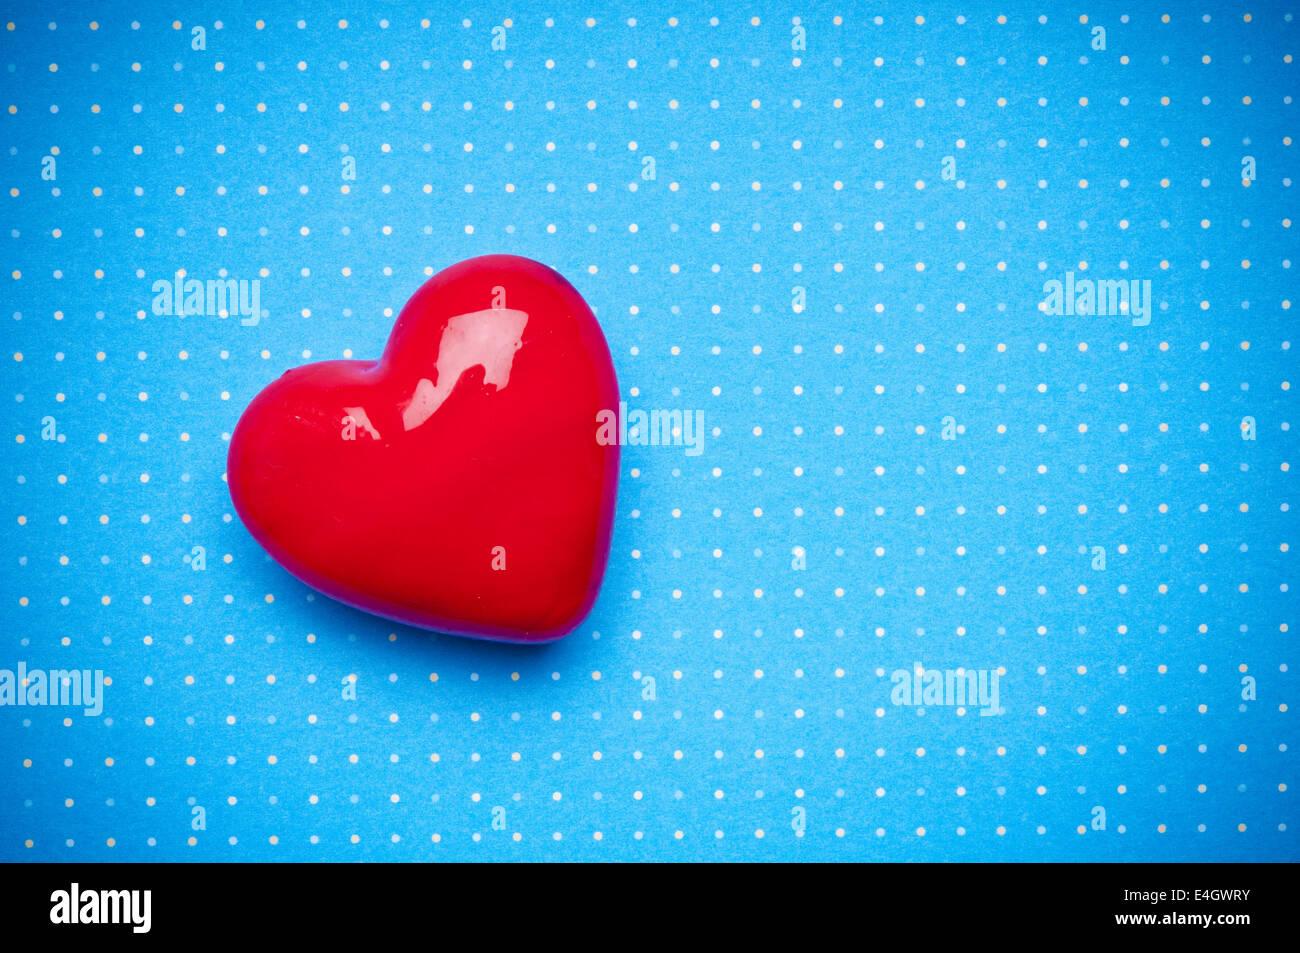 valentine heart shape, love concept - Stock Image